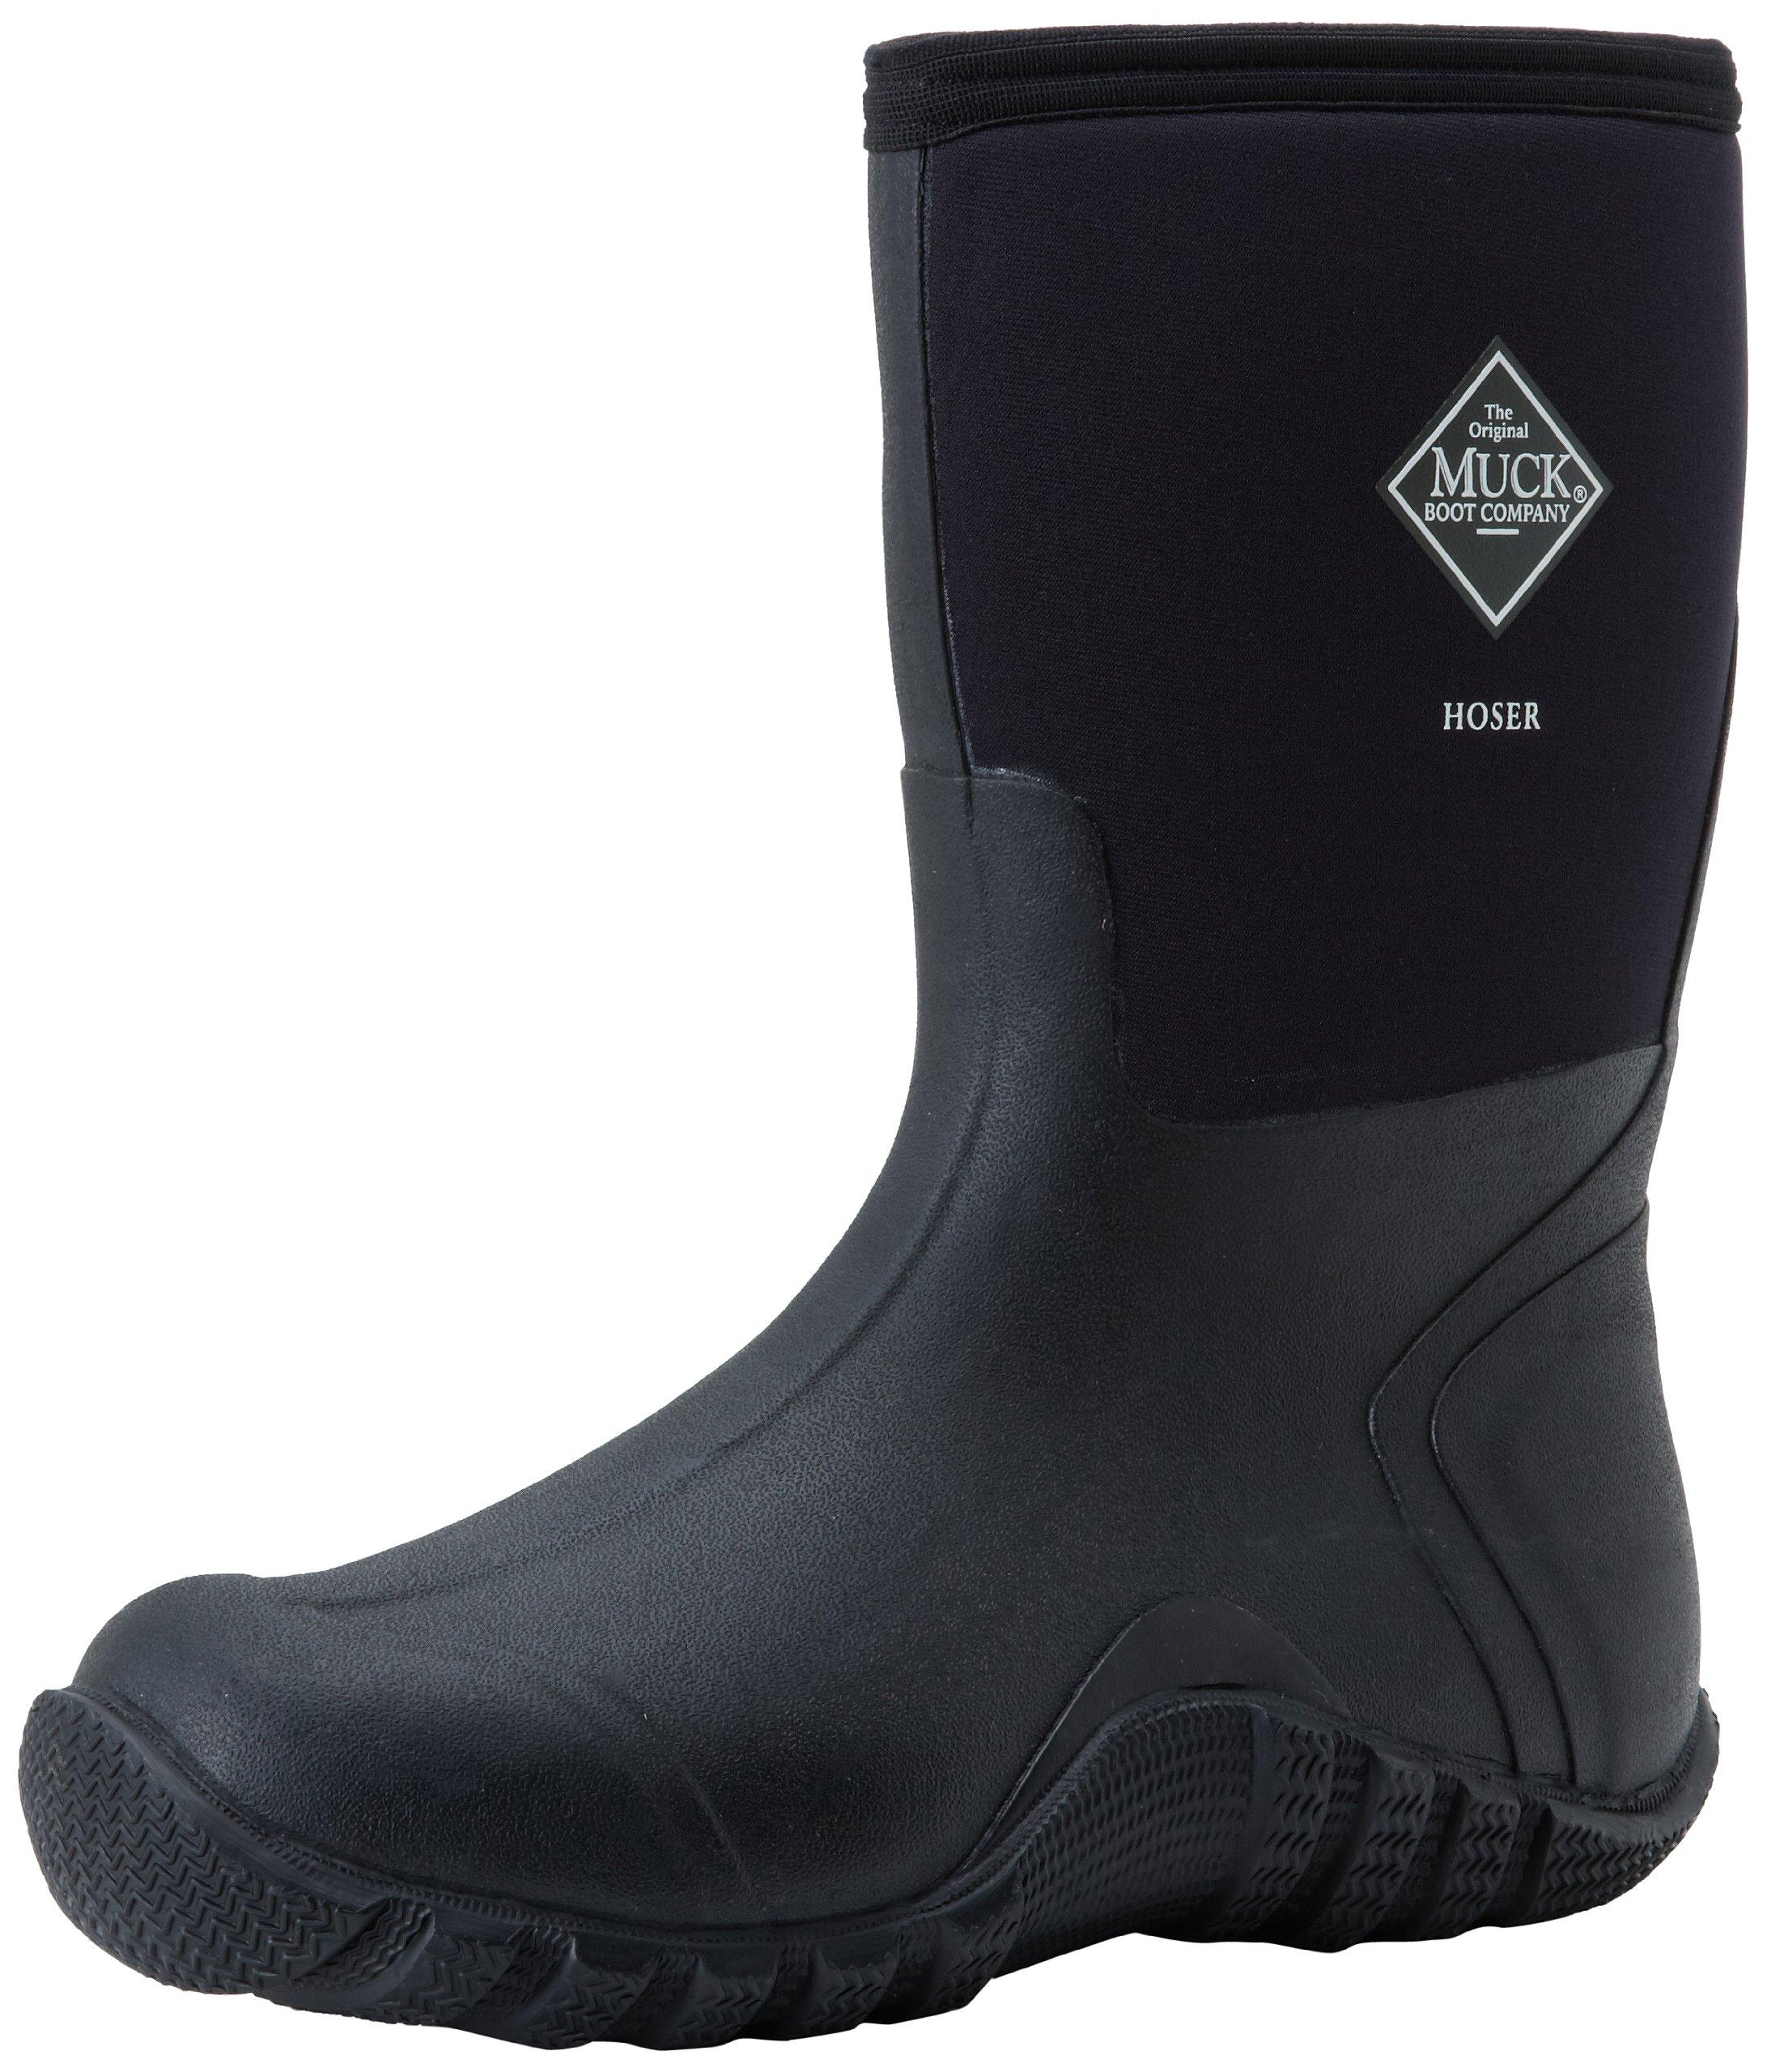 The Original MuckBoots Adult Hoser Mid Boot,Black,8 M US Mens/9 M US Womens